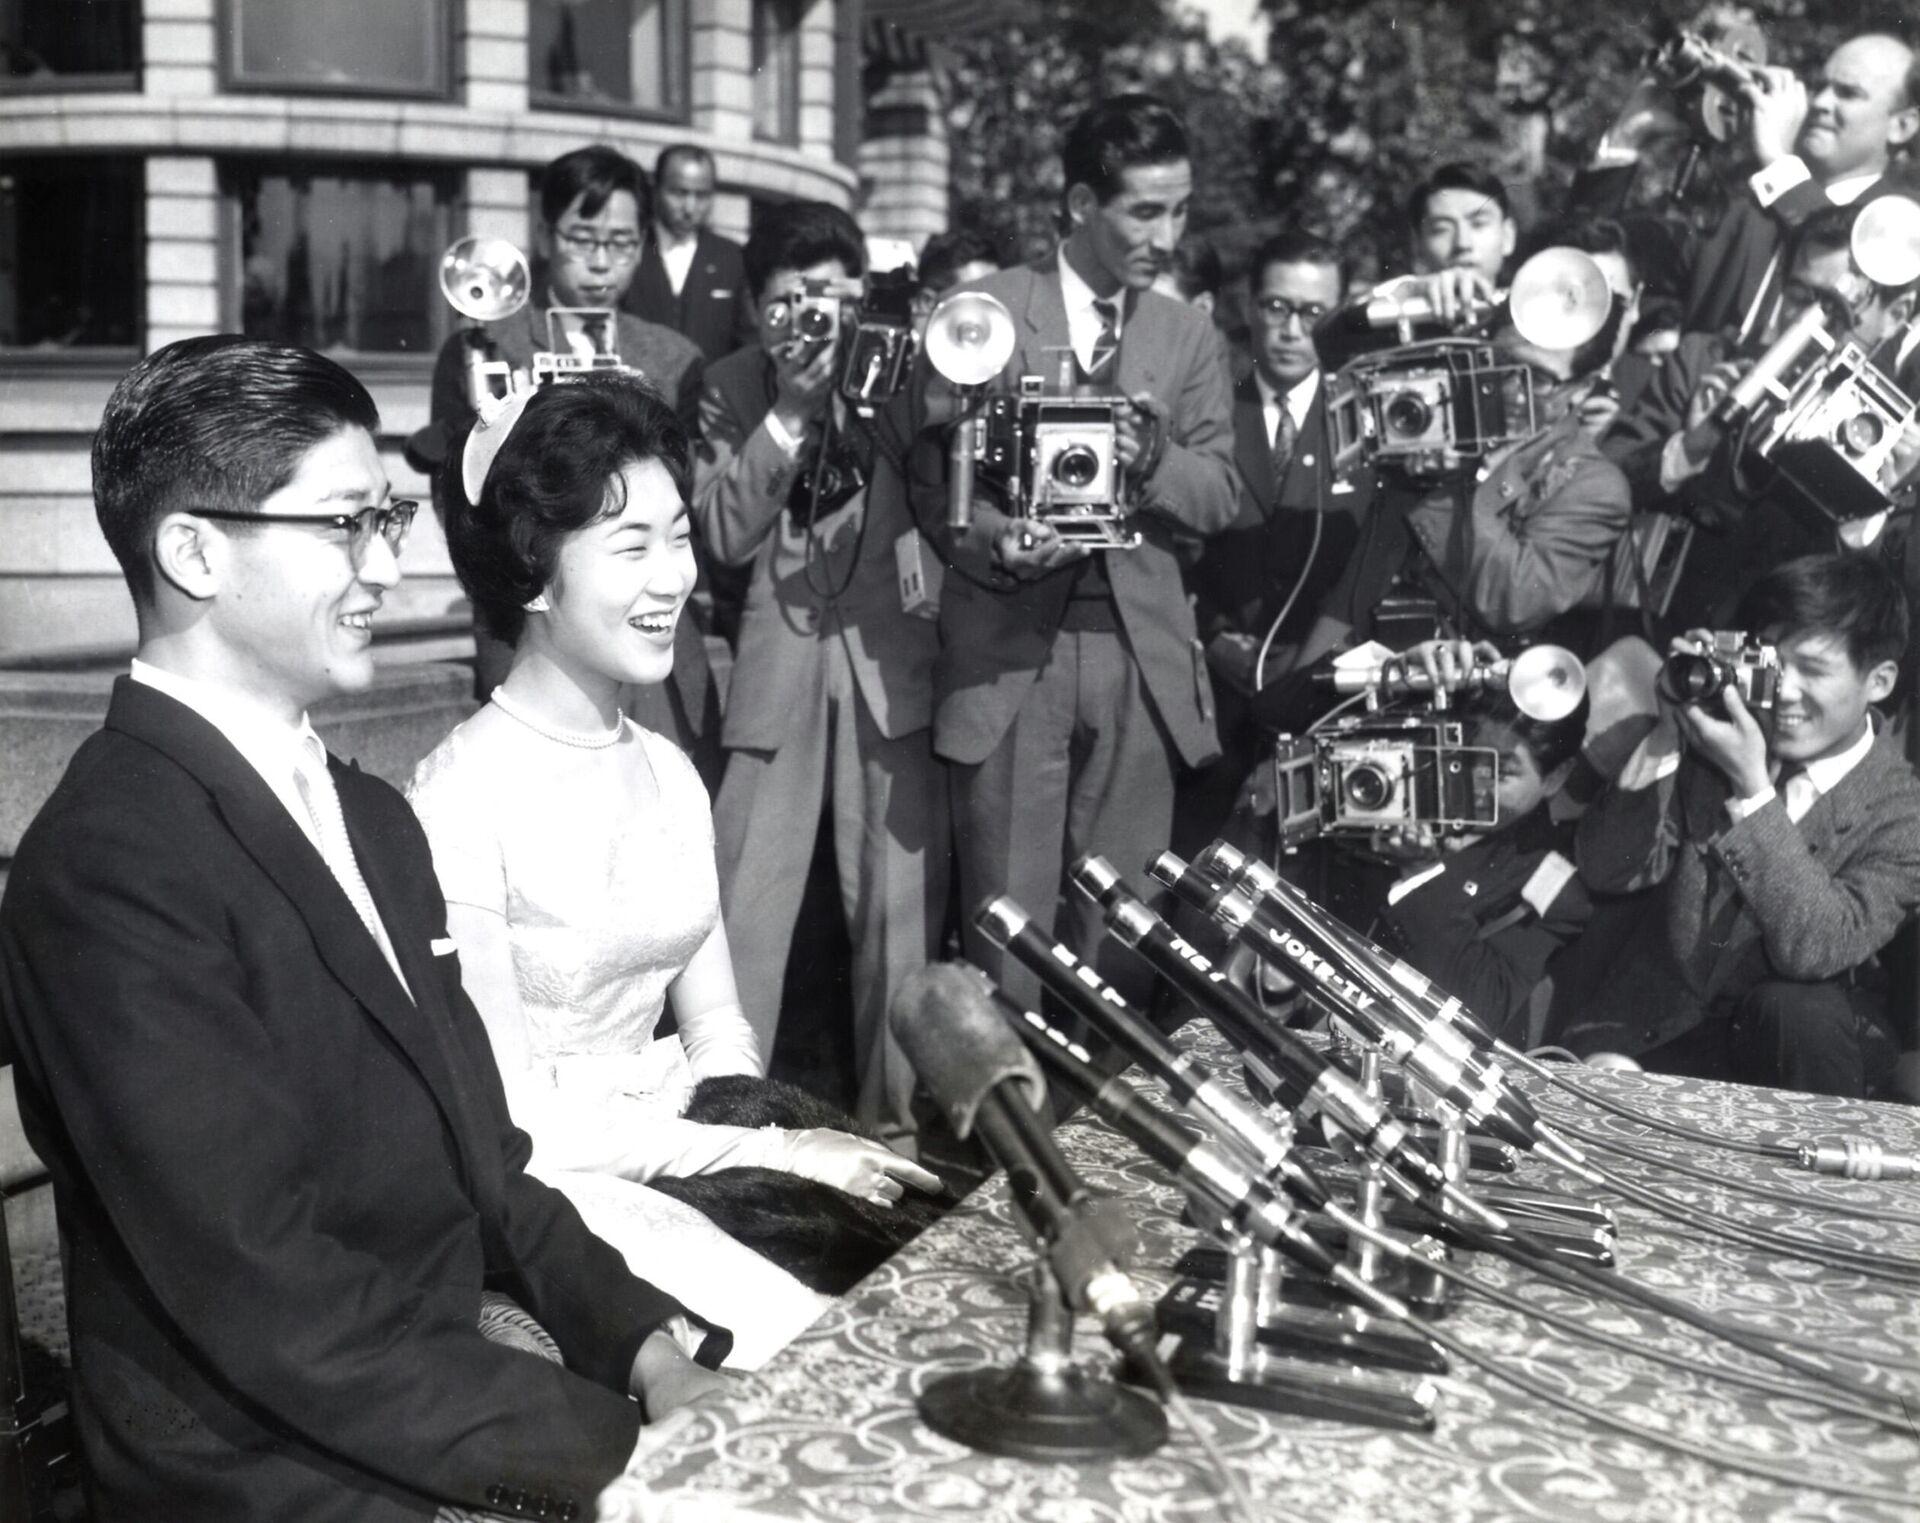 Una conferencia de prensa celebrada después de la boda de Takako y Hisanaga Shimazu - Sputnik Mundo, 1920, 29.09.2021